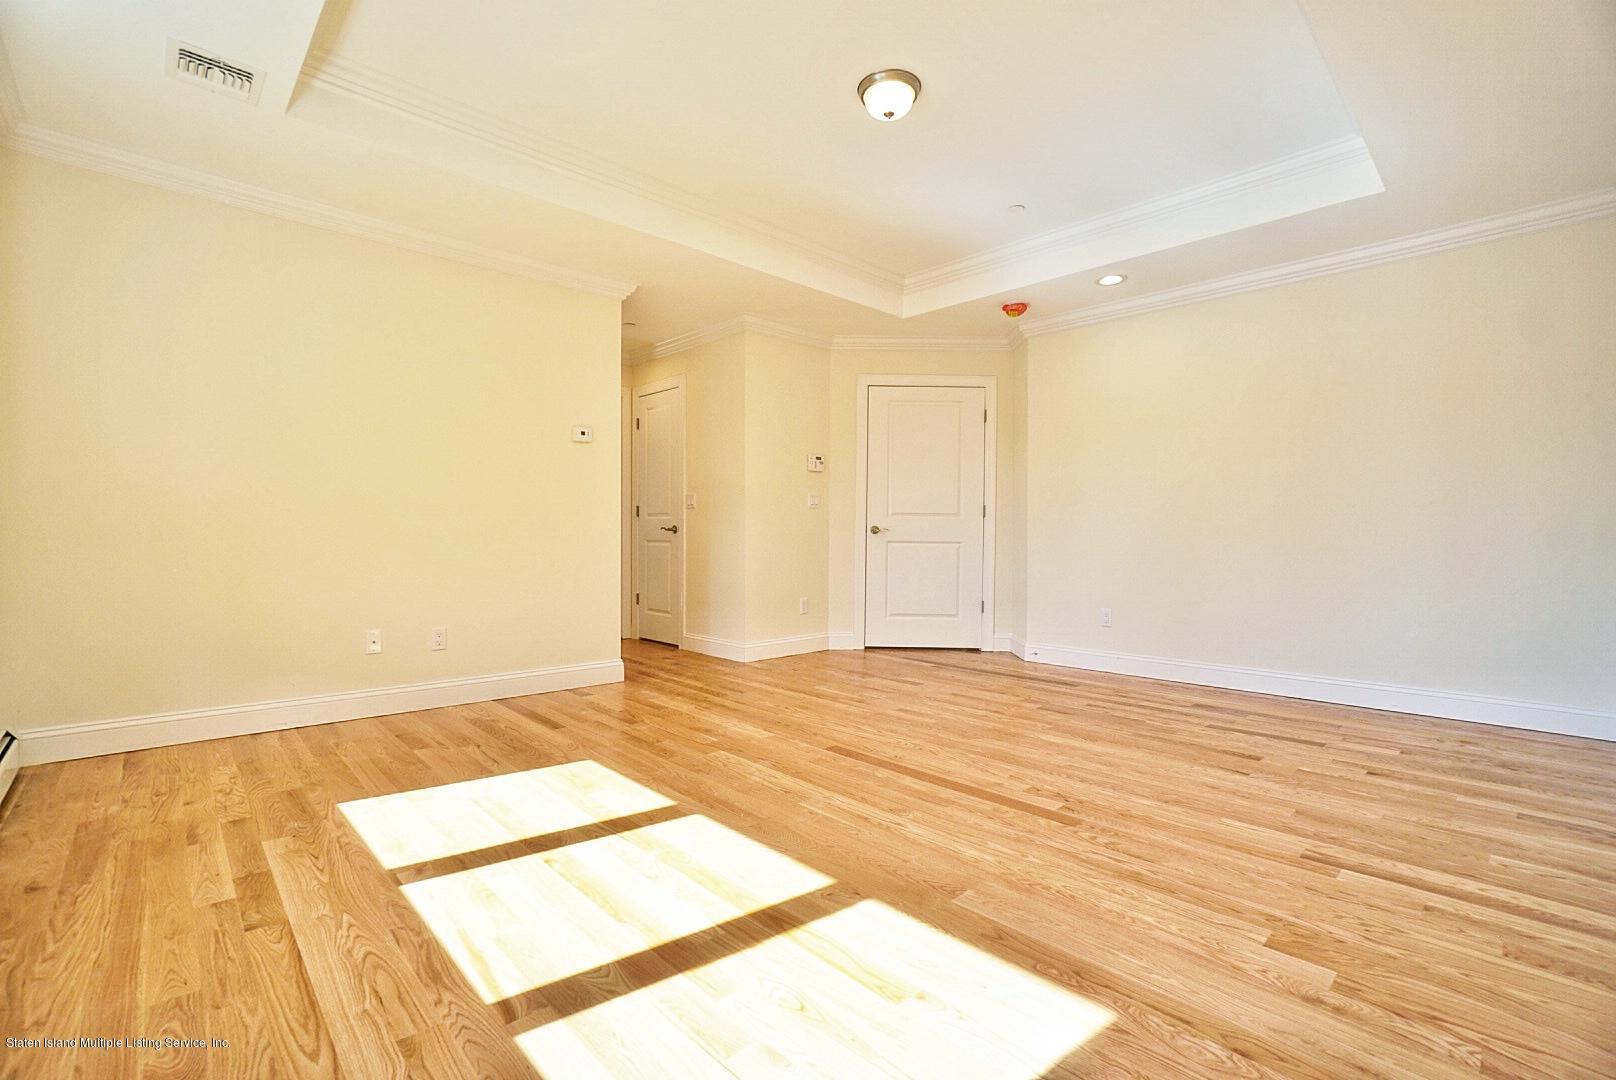 Single Family - Detached 678 Yetman Avenue  Staten Island, NY 10307, MLS-1132766-60